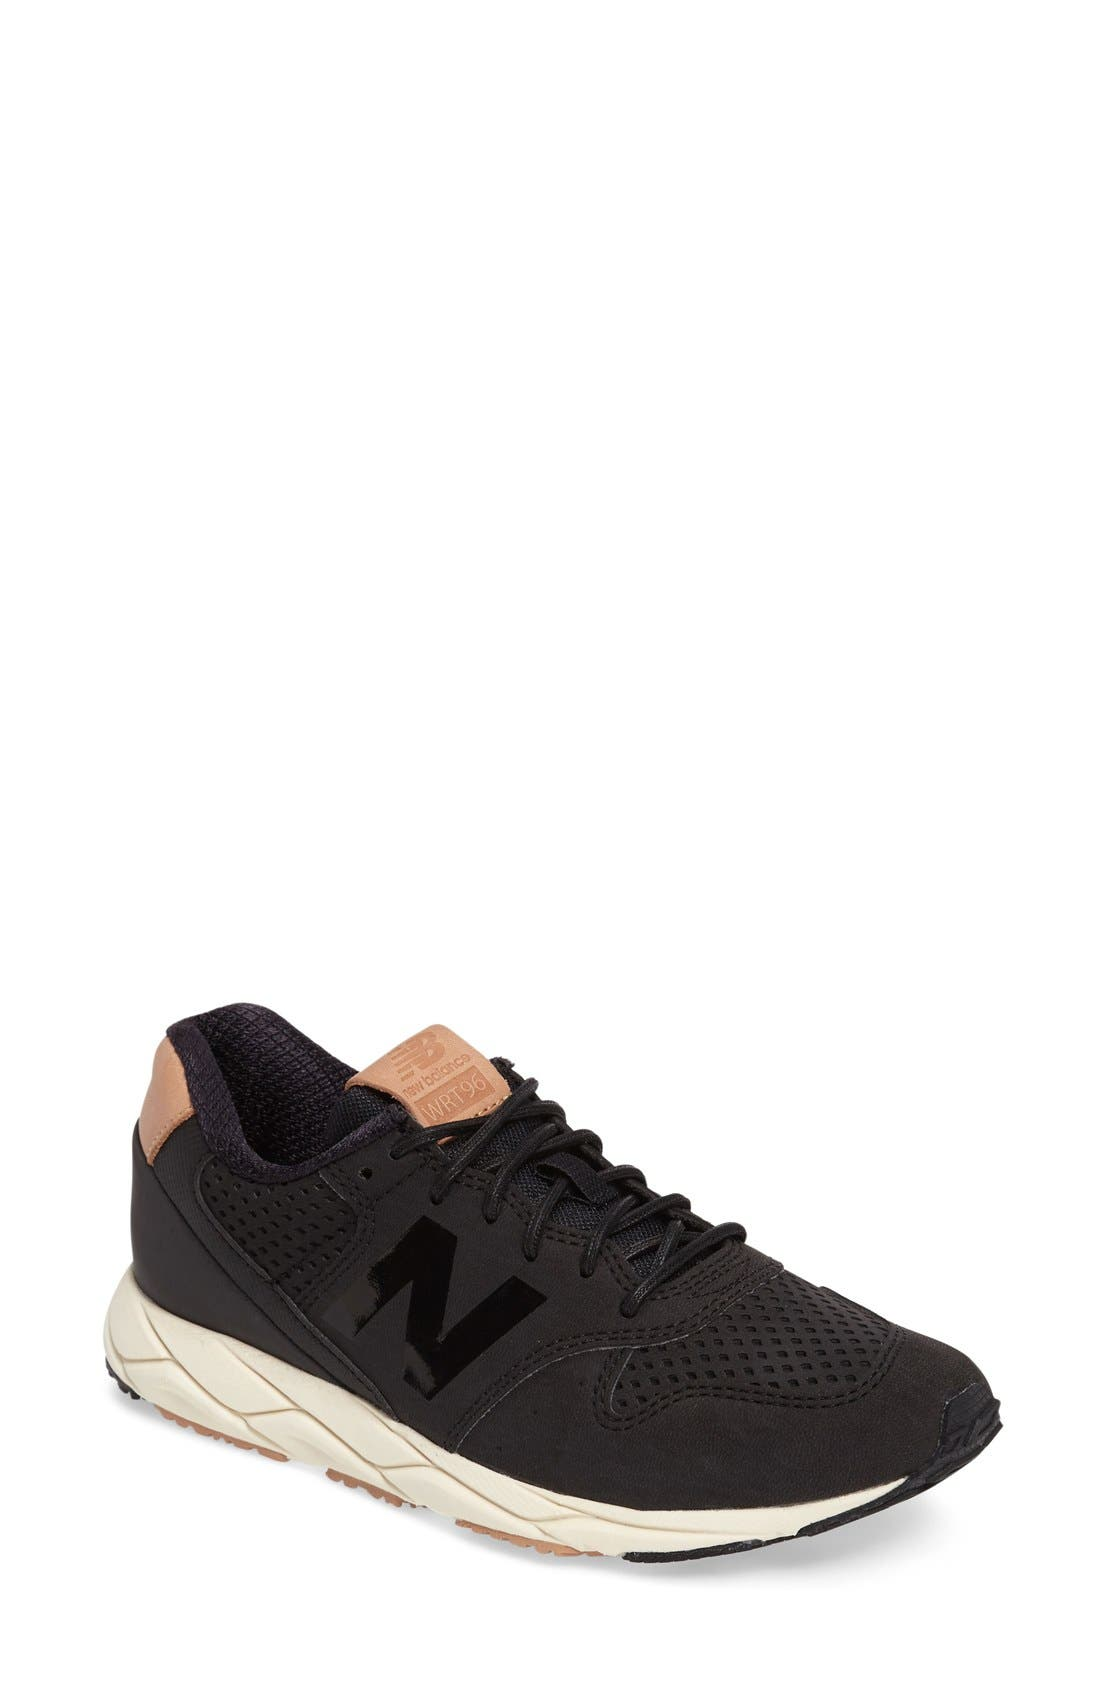 Alternate Image 1 Selected - New Balance 96 Mash-Up Sneaker (Women)